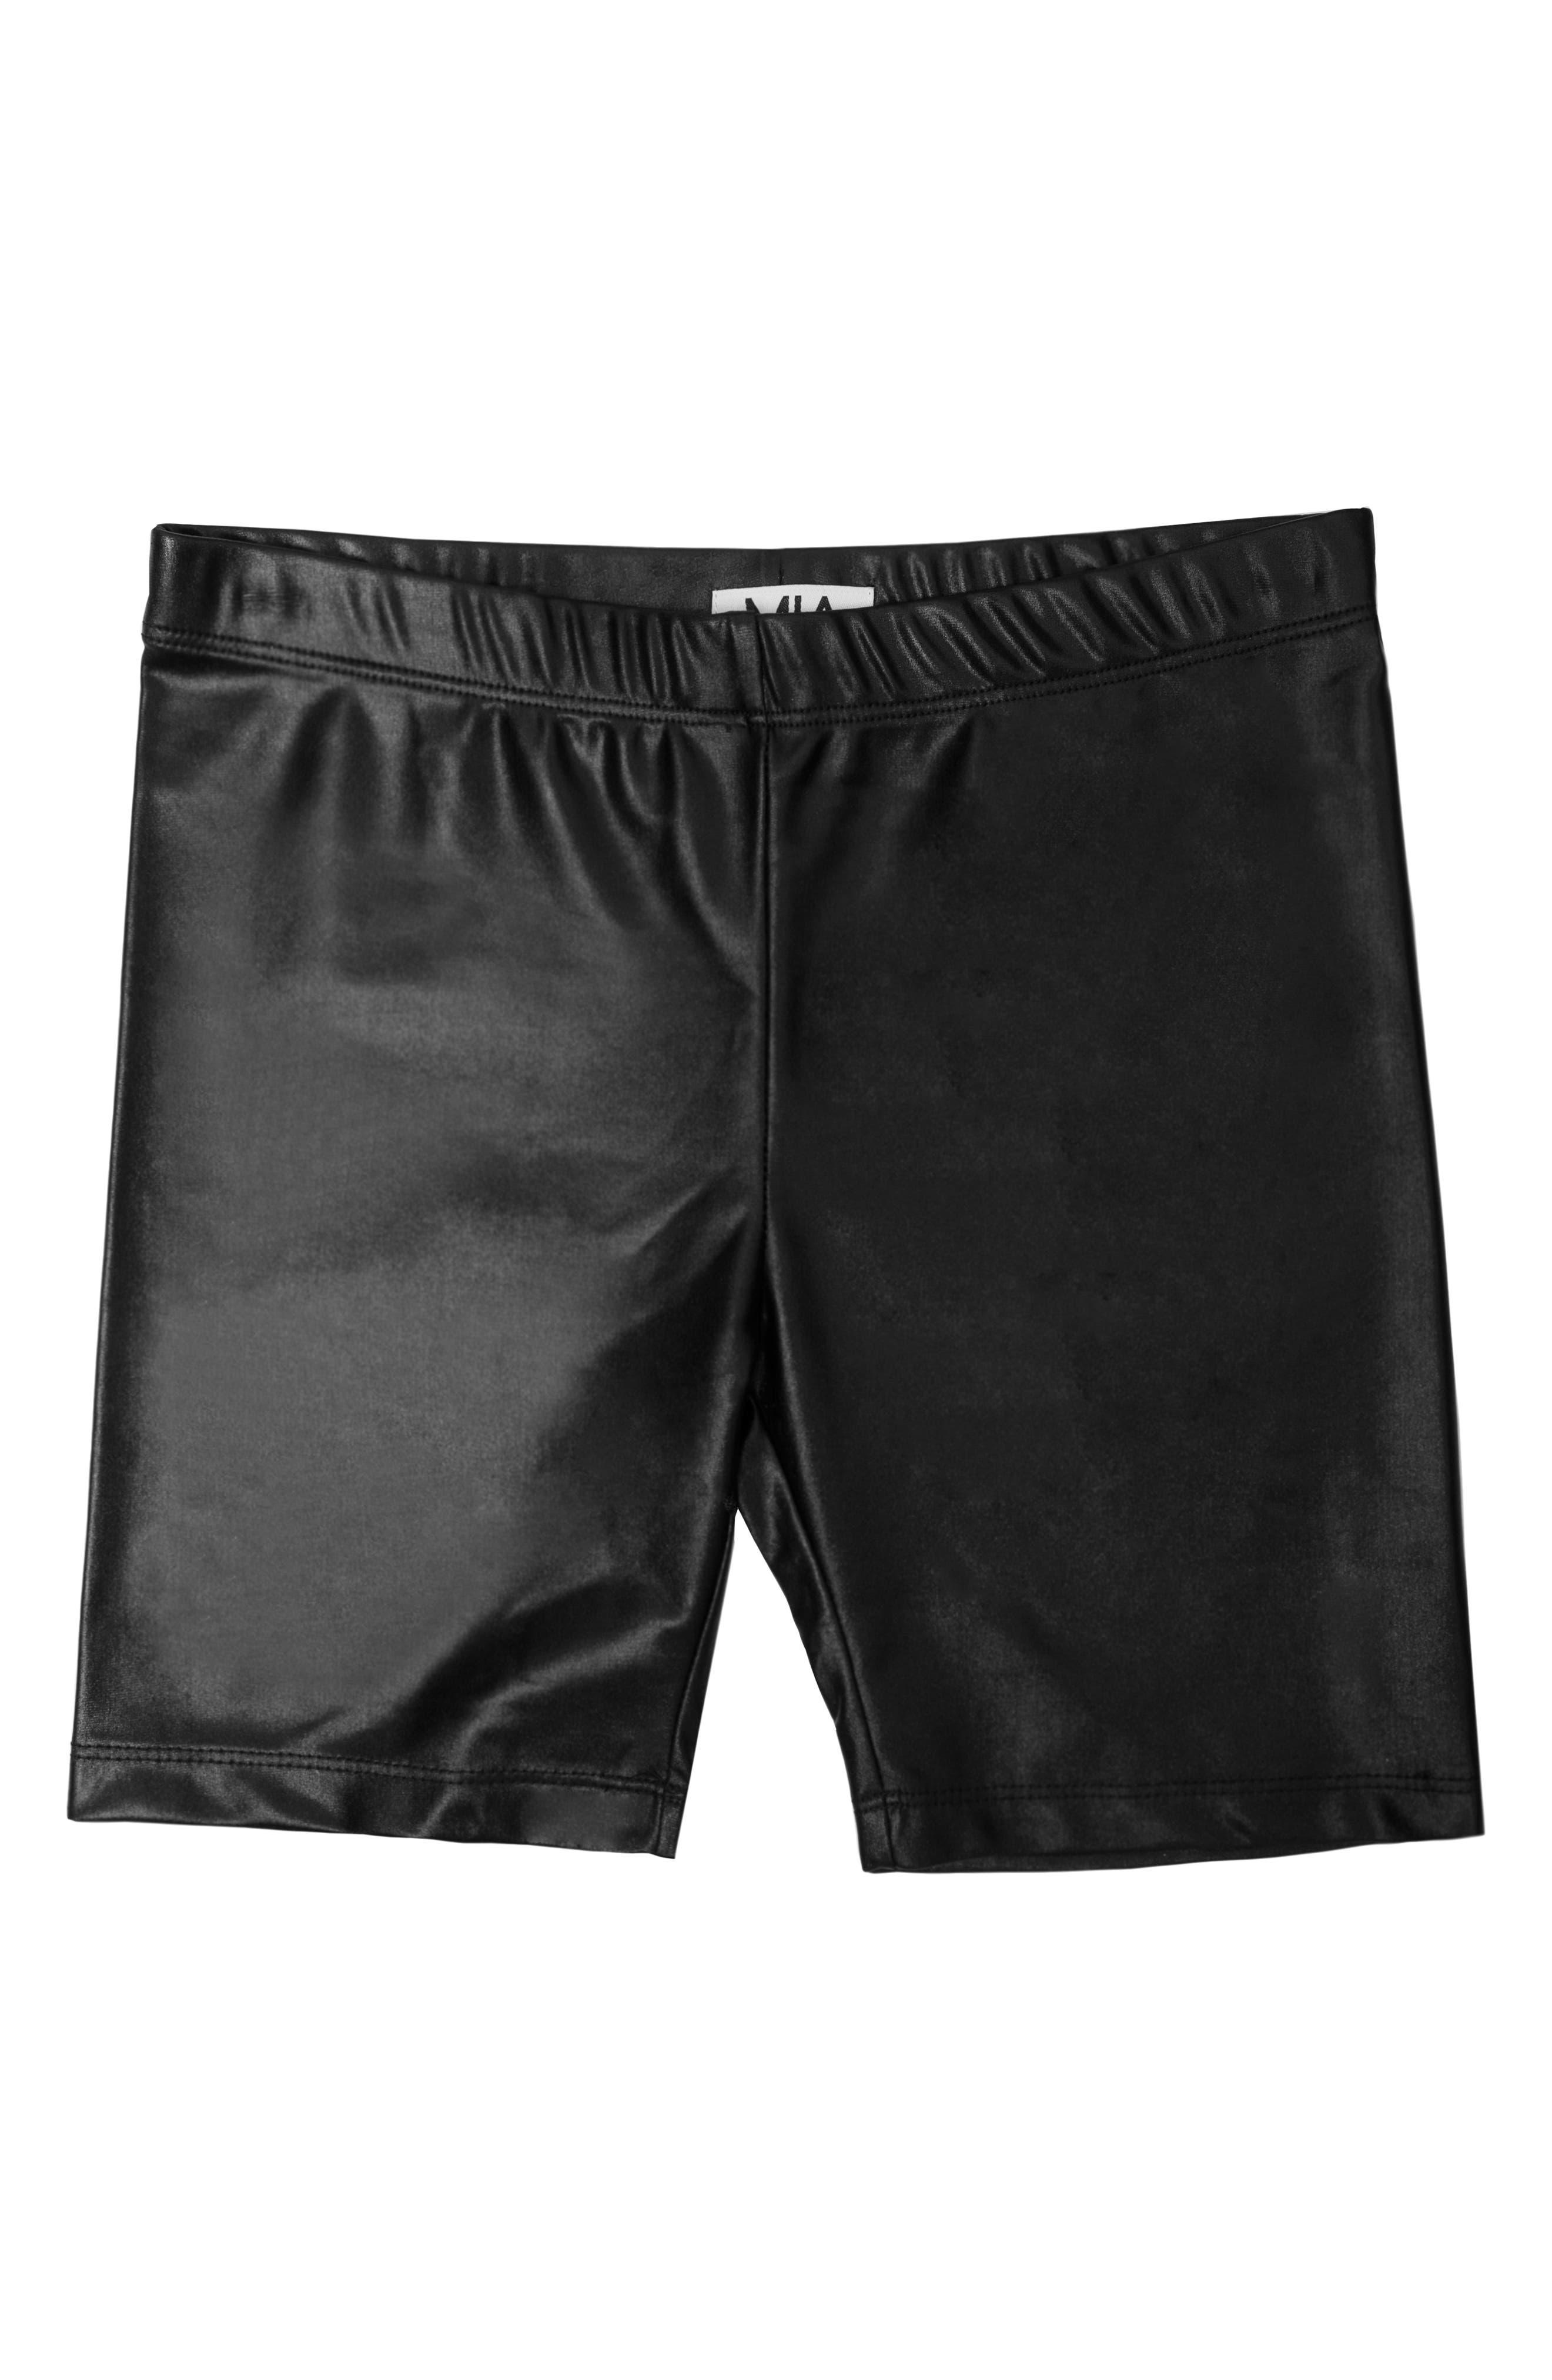 MIA New York Girl's Mia New York Bike Shorts, Size L - Black